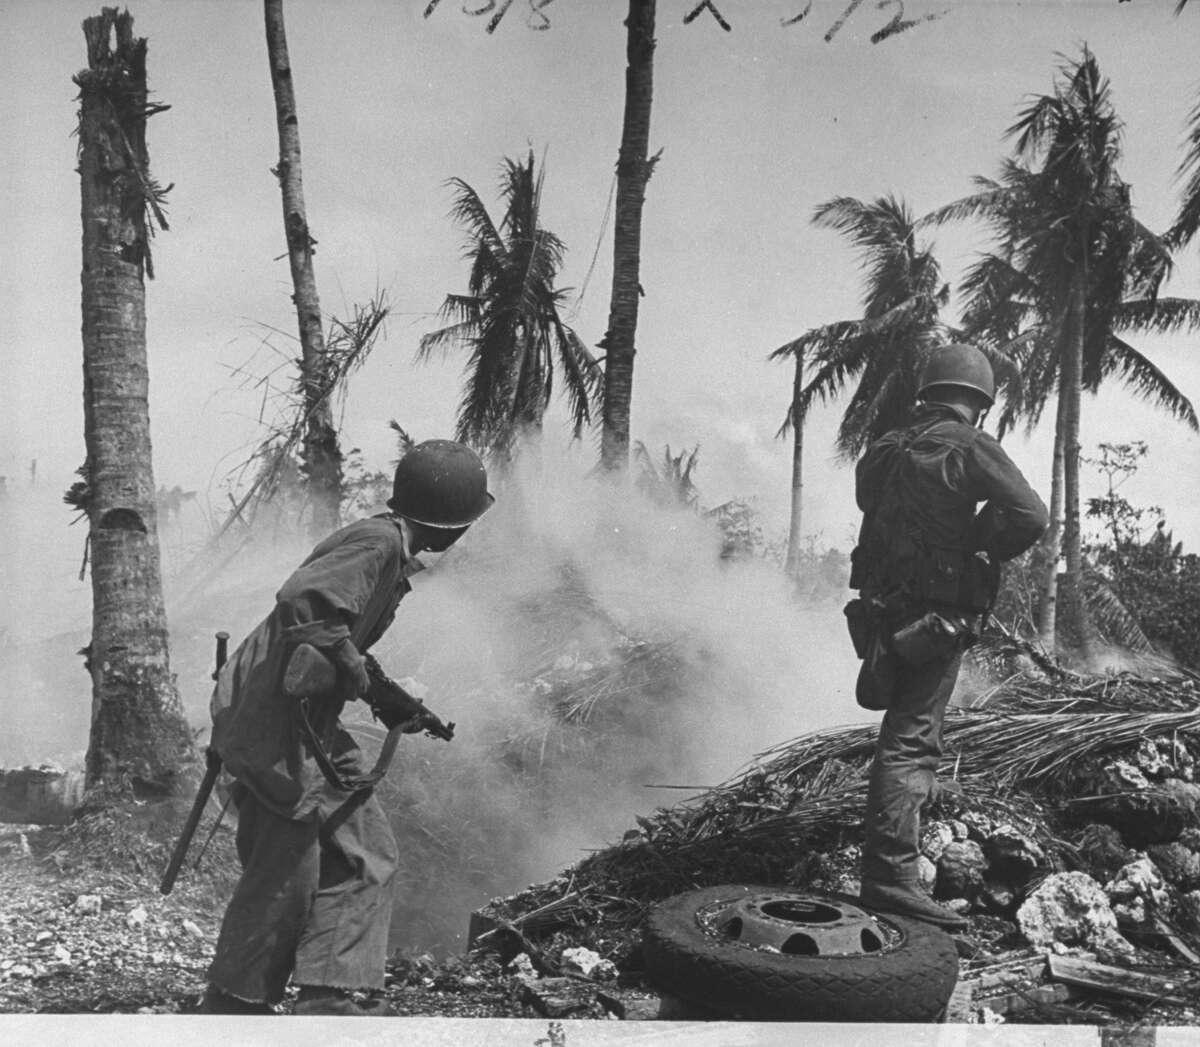 Historic WWII photos show gritty U.S. Marine struggle over Guam